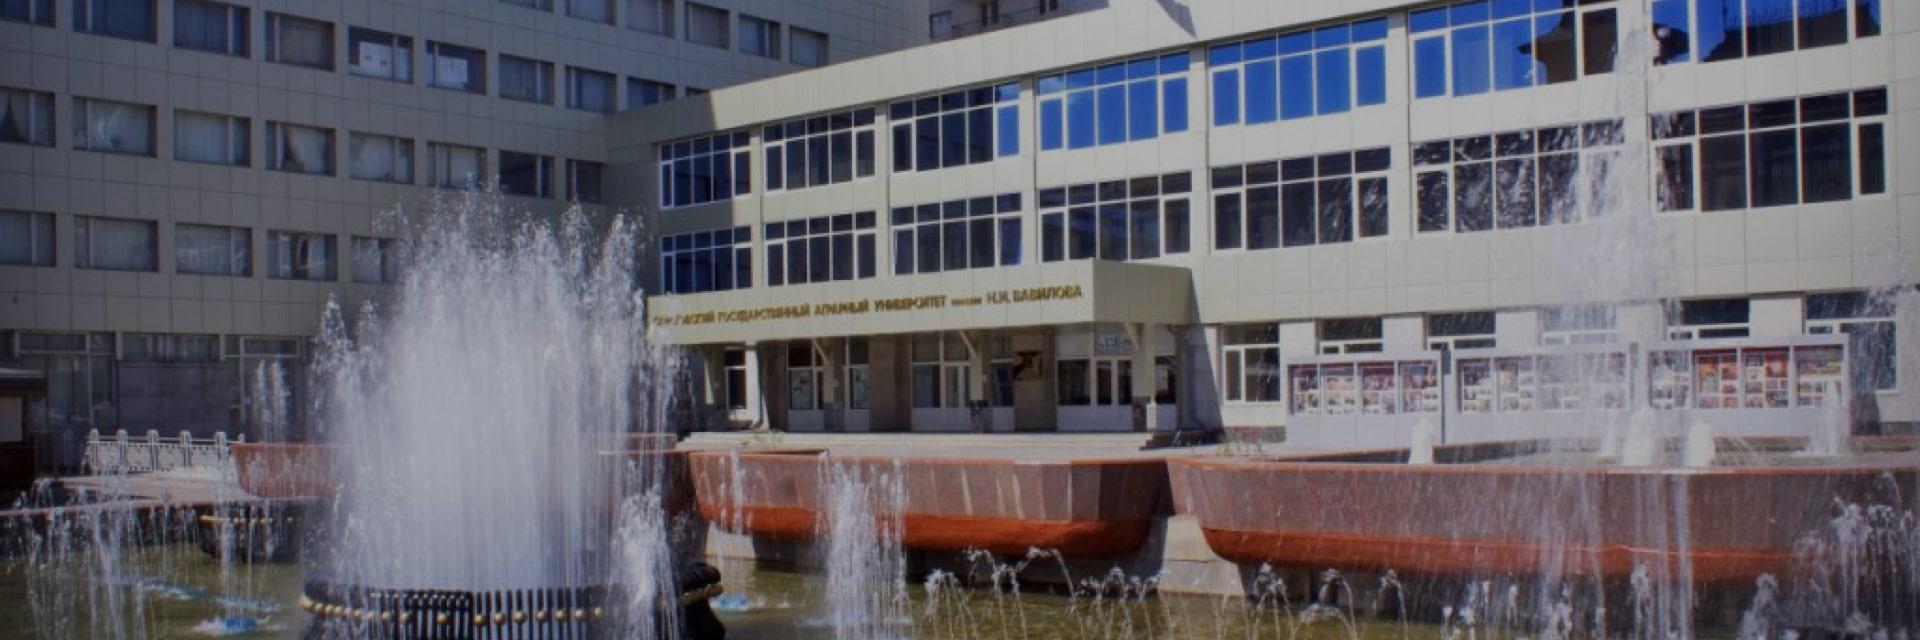 Saratov State Agrarian University